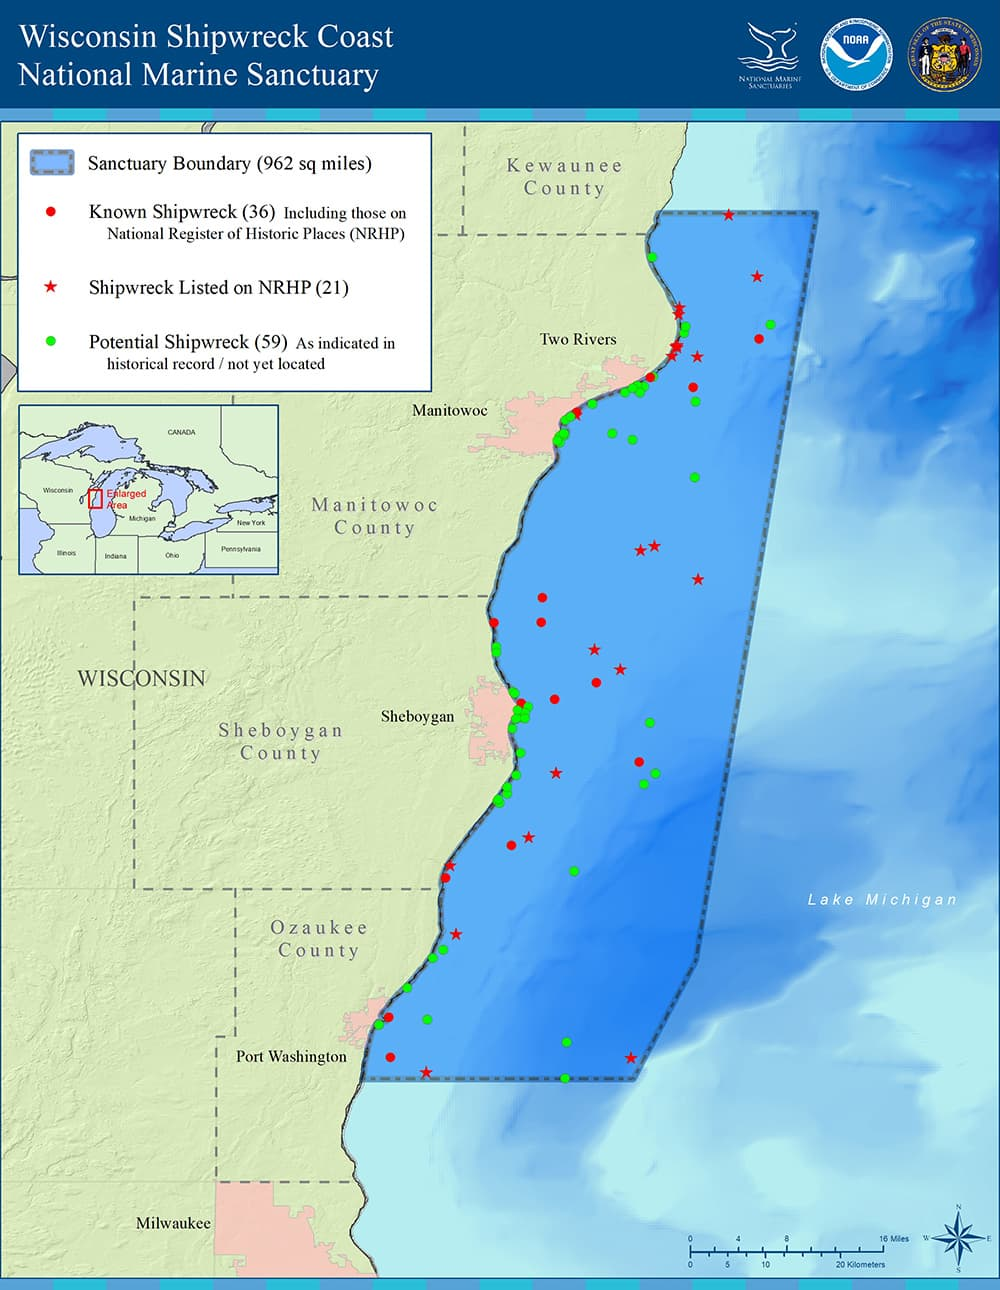 map showing Wisconsin Shipwreck Coast National Marine Sanctuary boundry